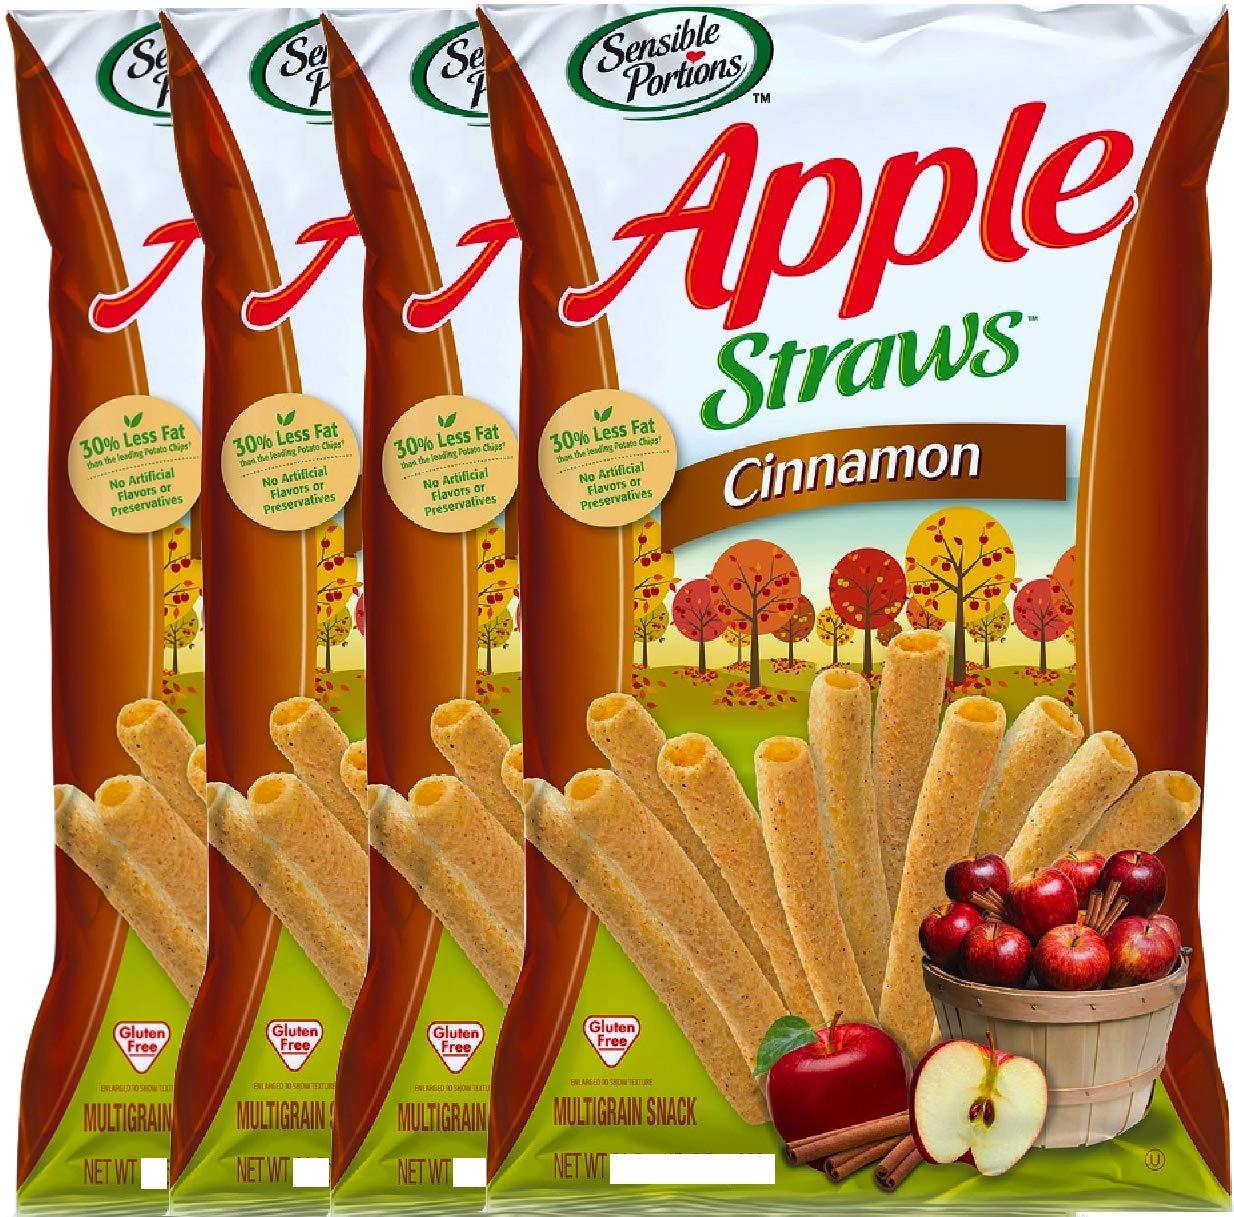 NEW Sensible Portions Apple Cinnamon StrawsGluten Free Multigrain Snack Net Wt 5oz (4)